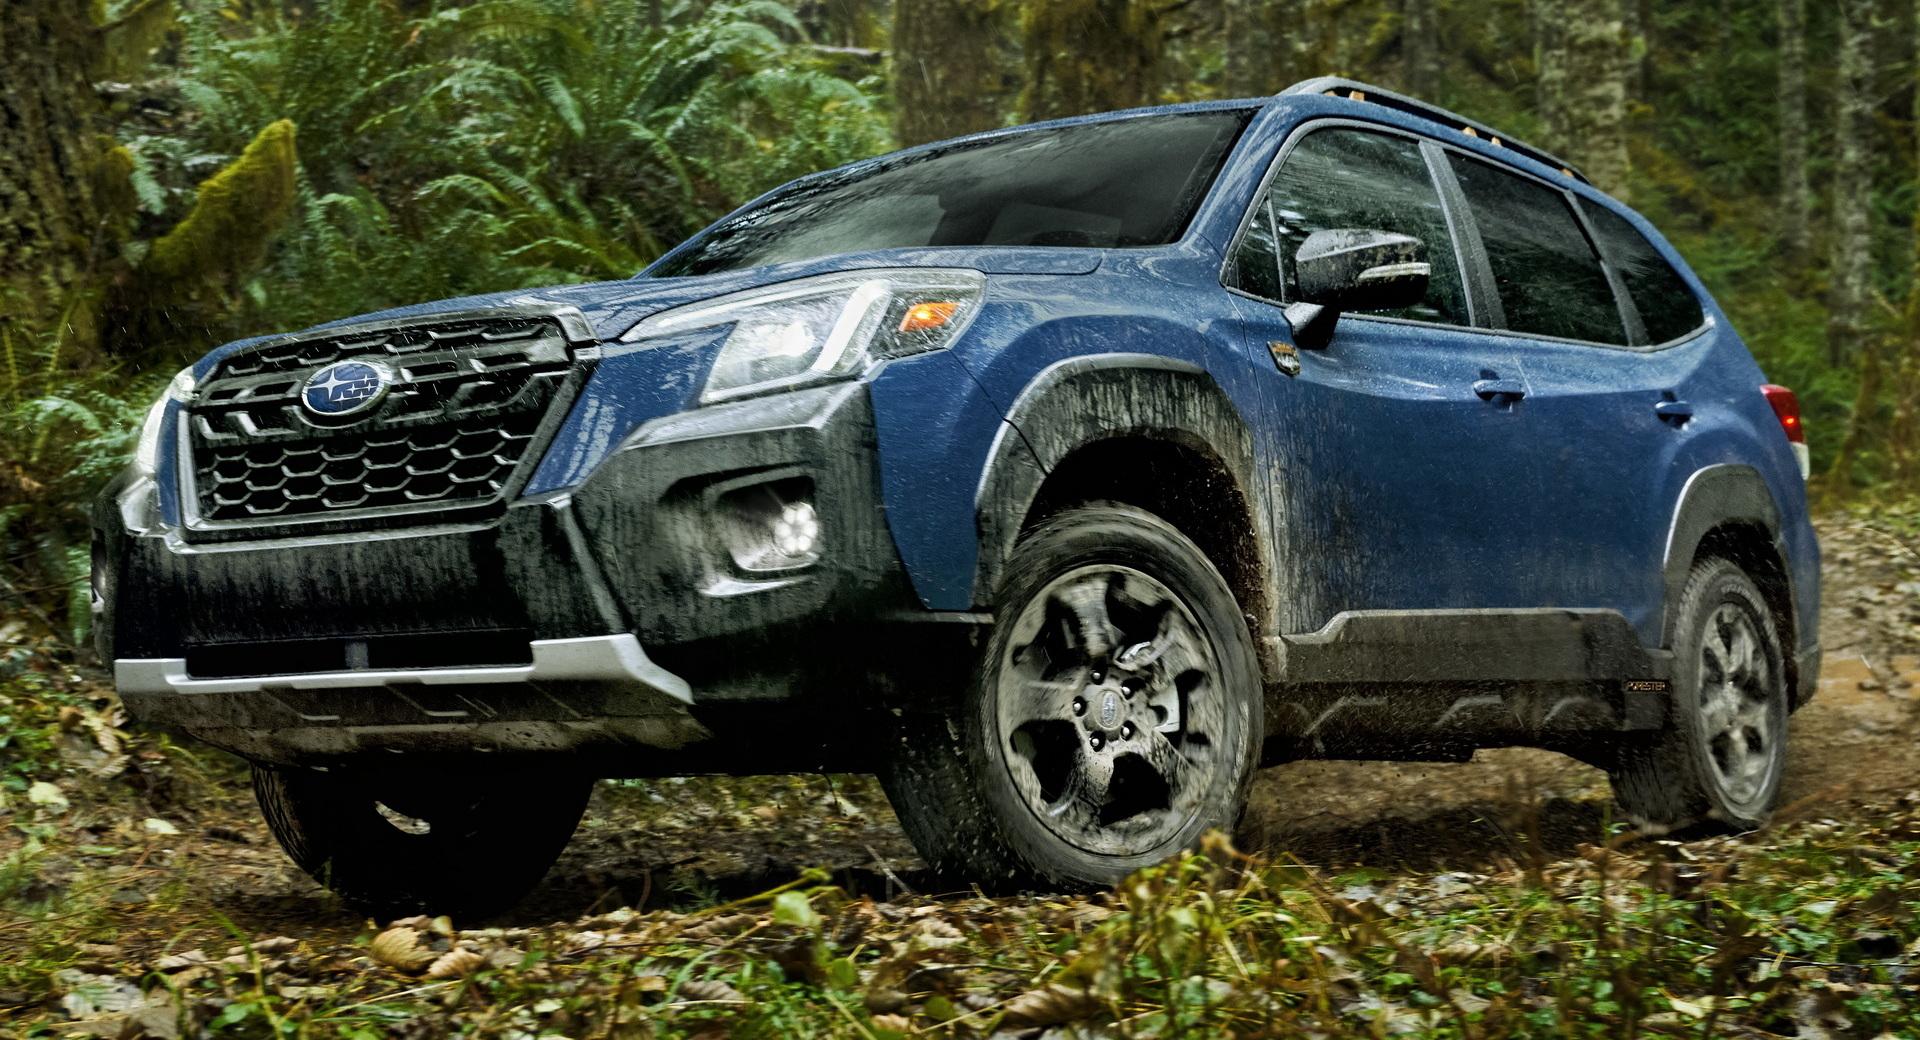 Subaru Forester 2022 ra mắt, bổ sung thêm phiên bản Wilderness mới 2022-subaru-forester-wilderness-12.jpeg